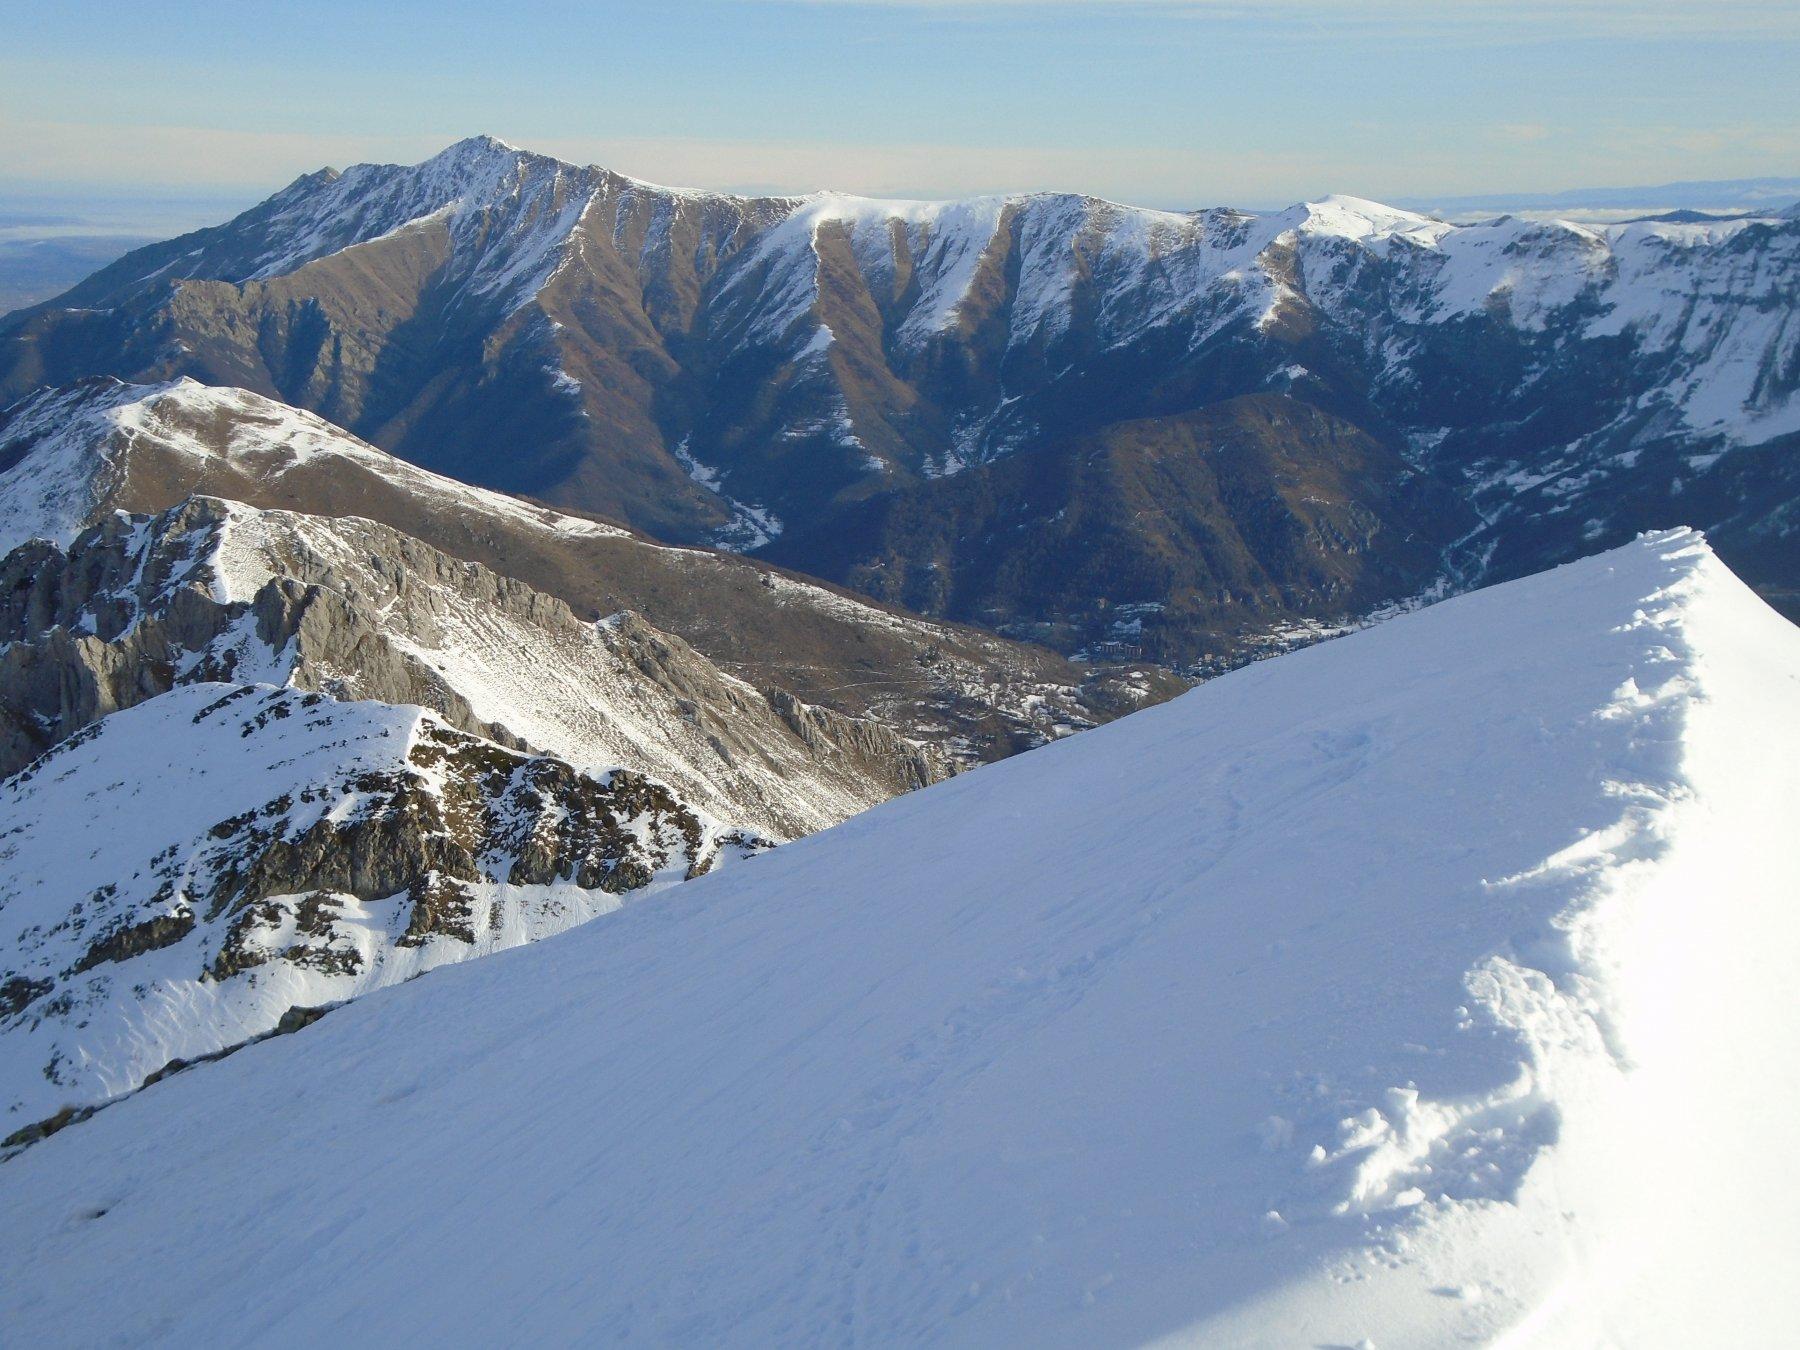 Bric Costa Rossa senza neve